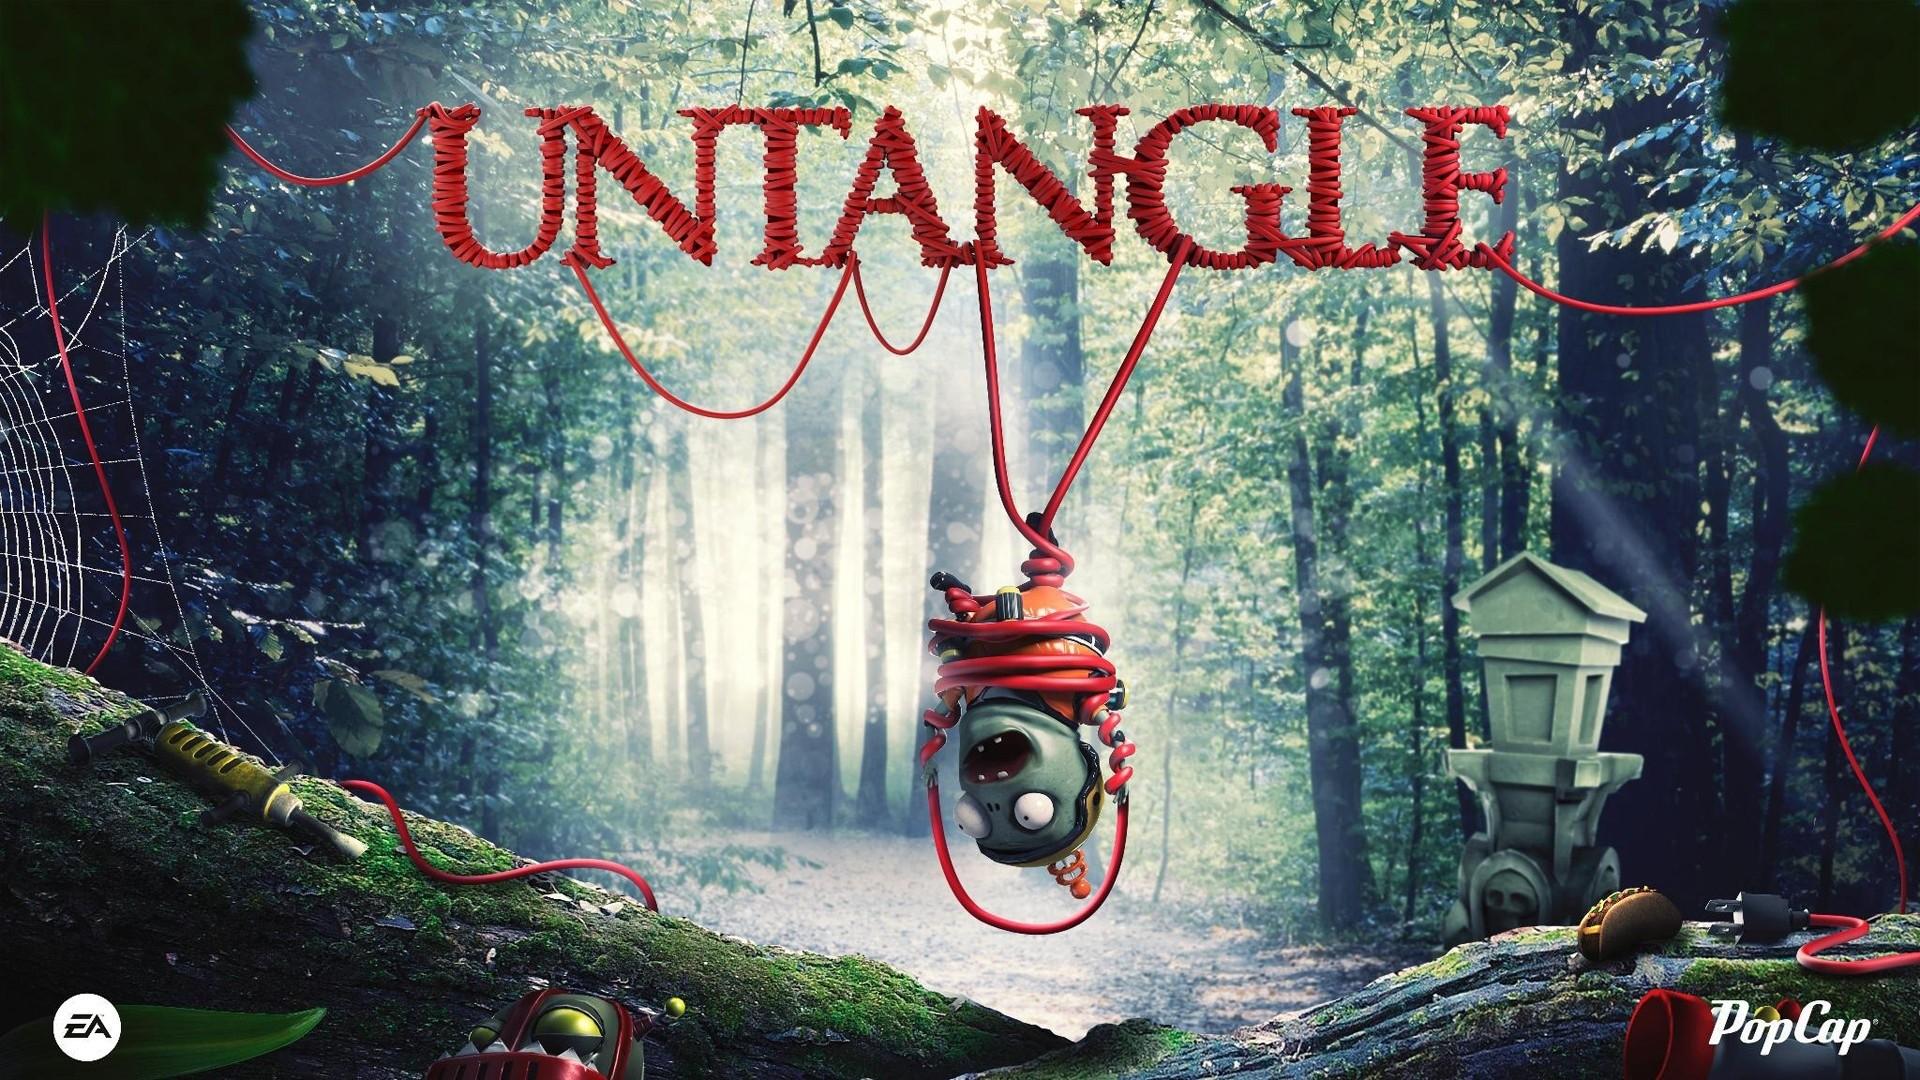 Fondos de pantalla Juego Untangle